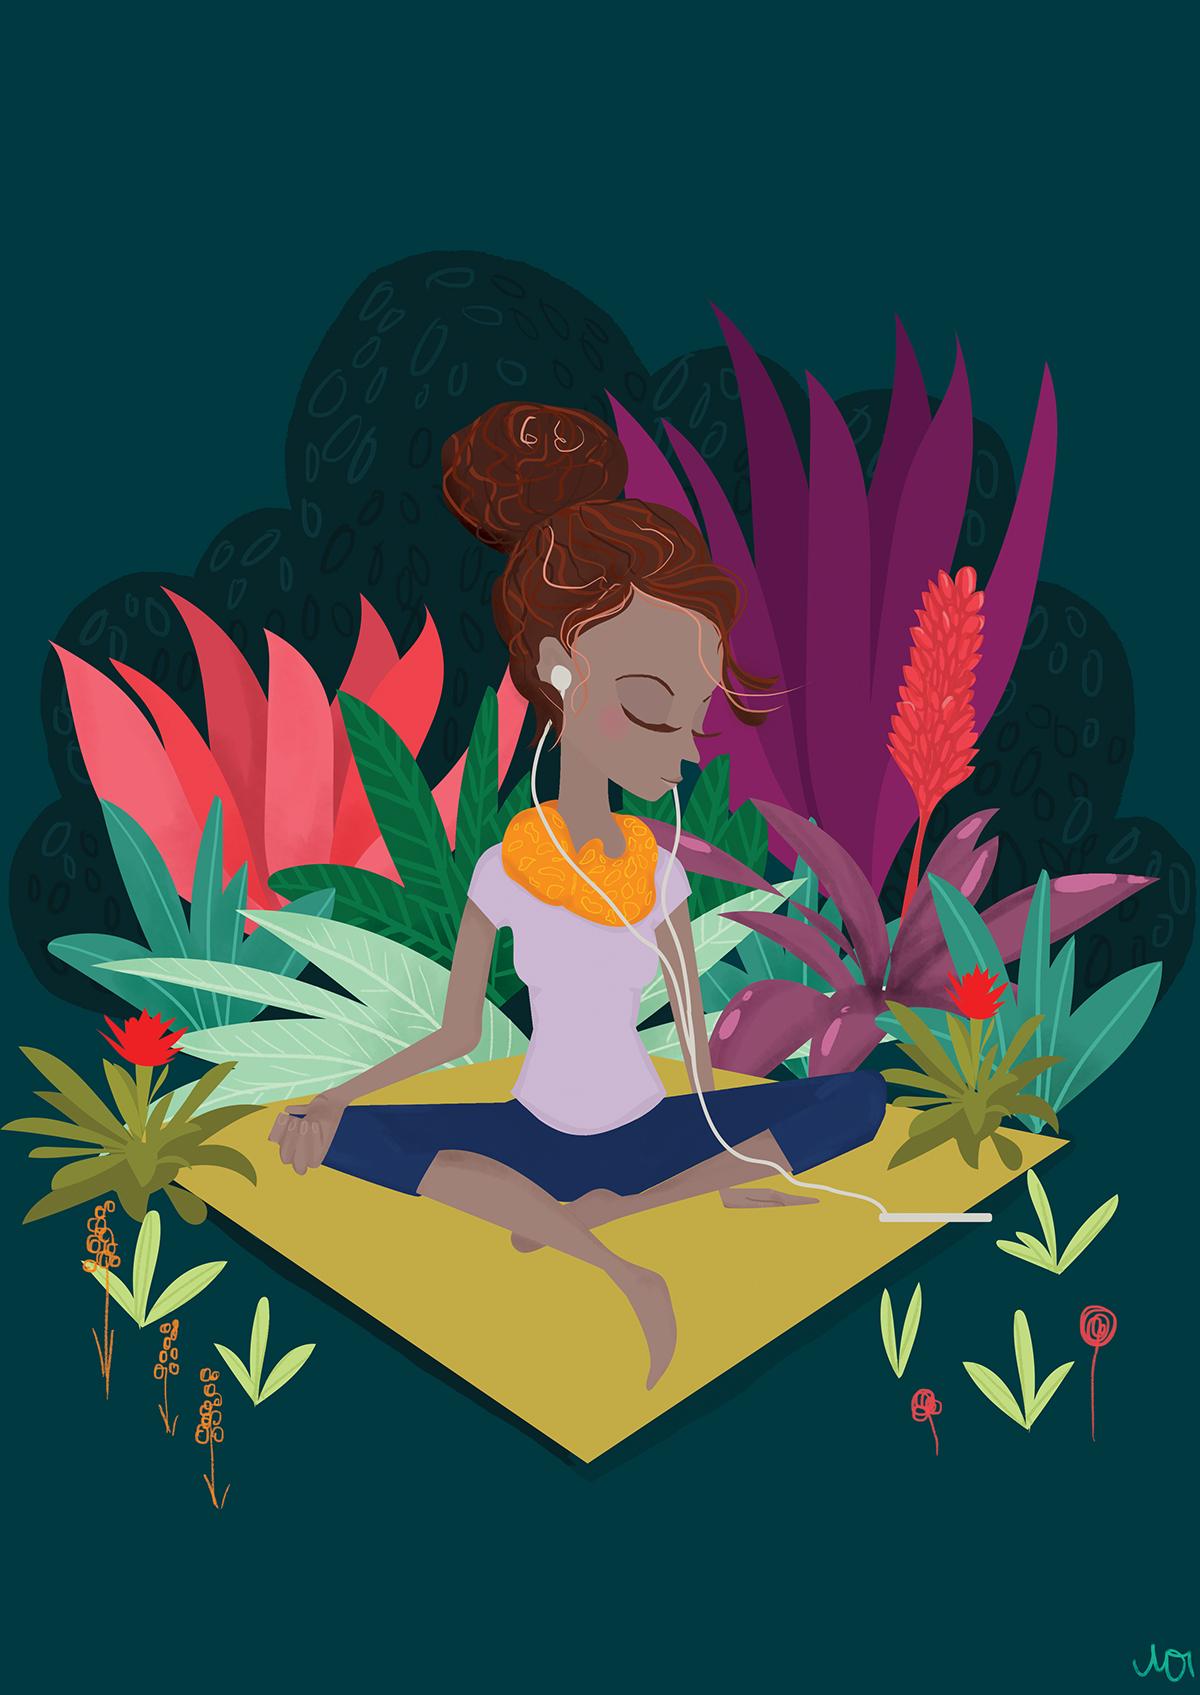 women reflect meditation Create bright garden vector Character texture hope